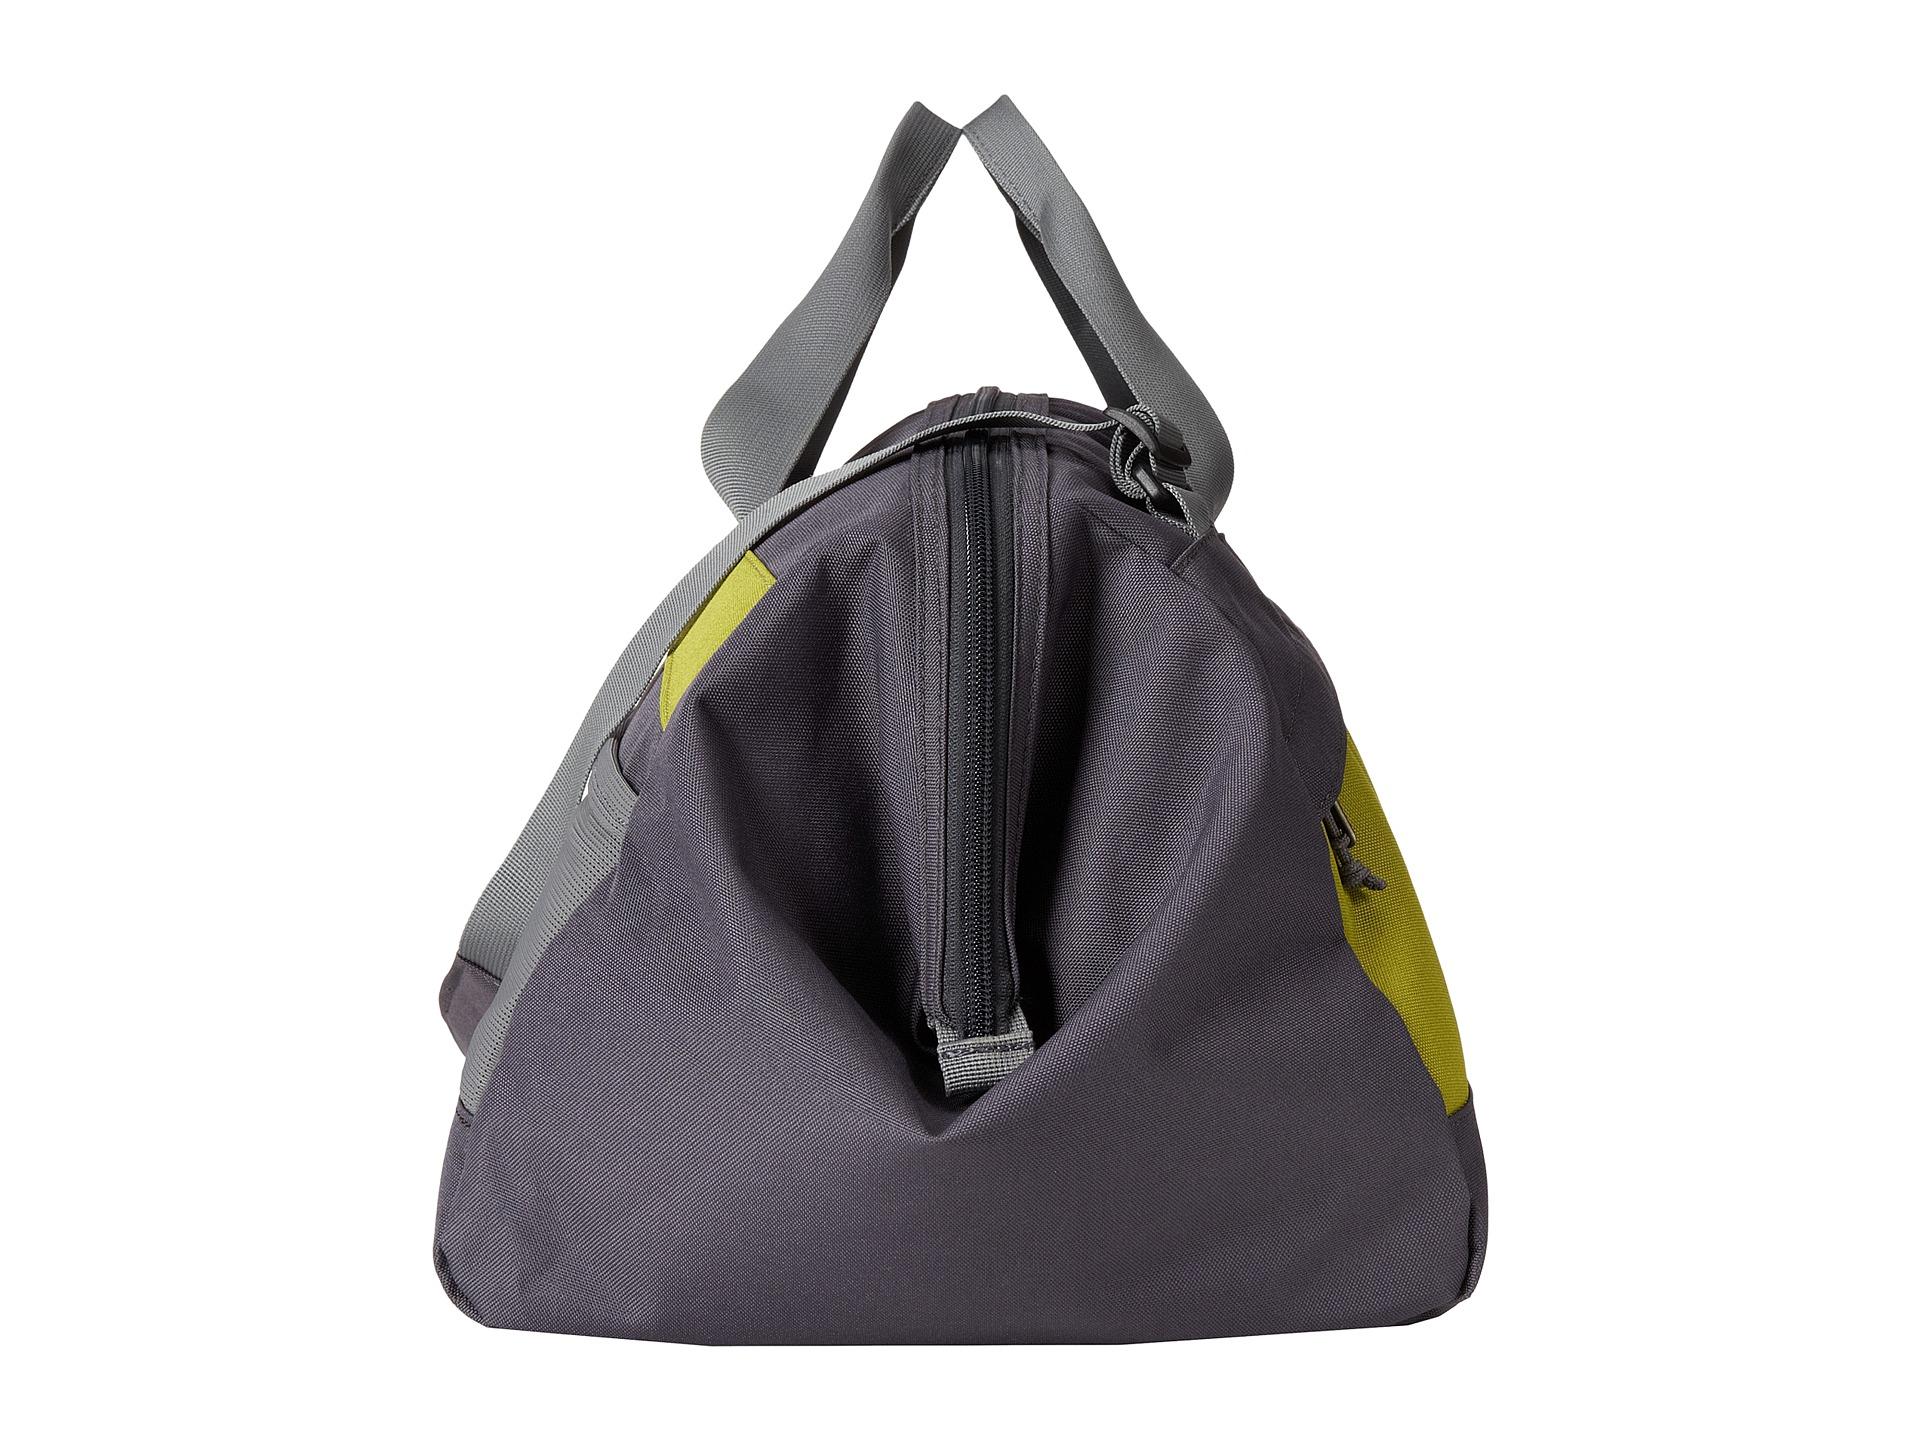 ruffwear haul bag at zappos